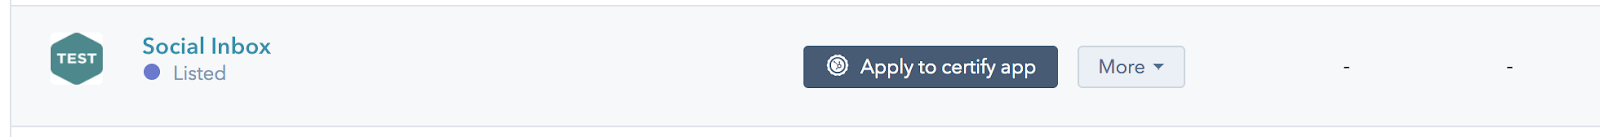 HubSpot Developer Portal Certification Application